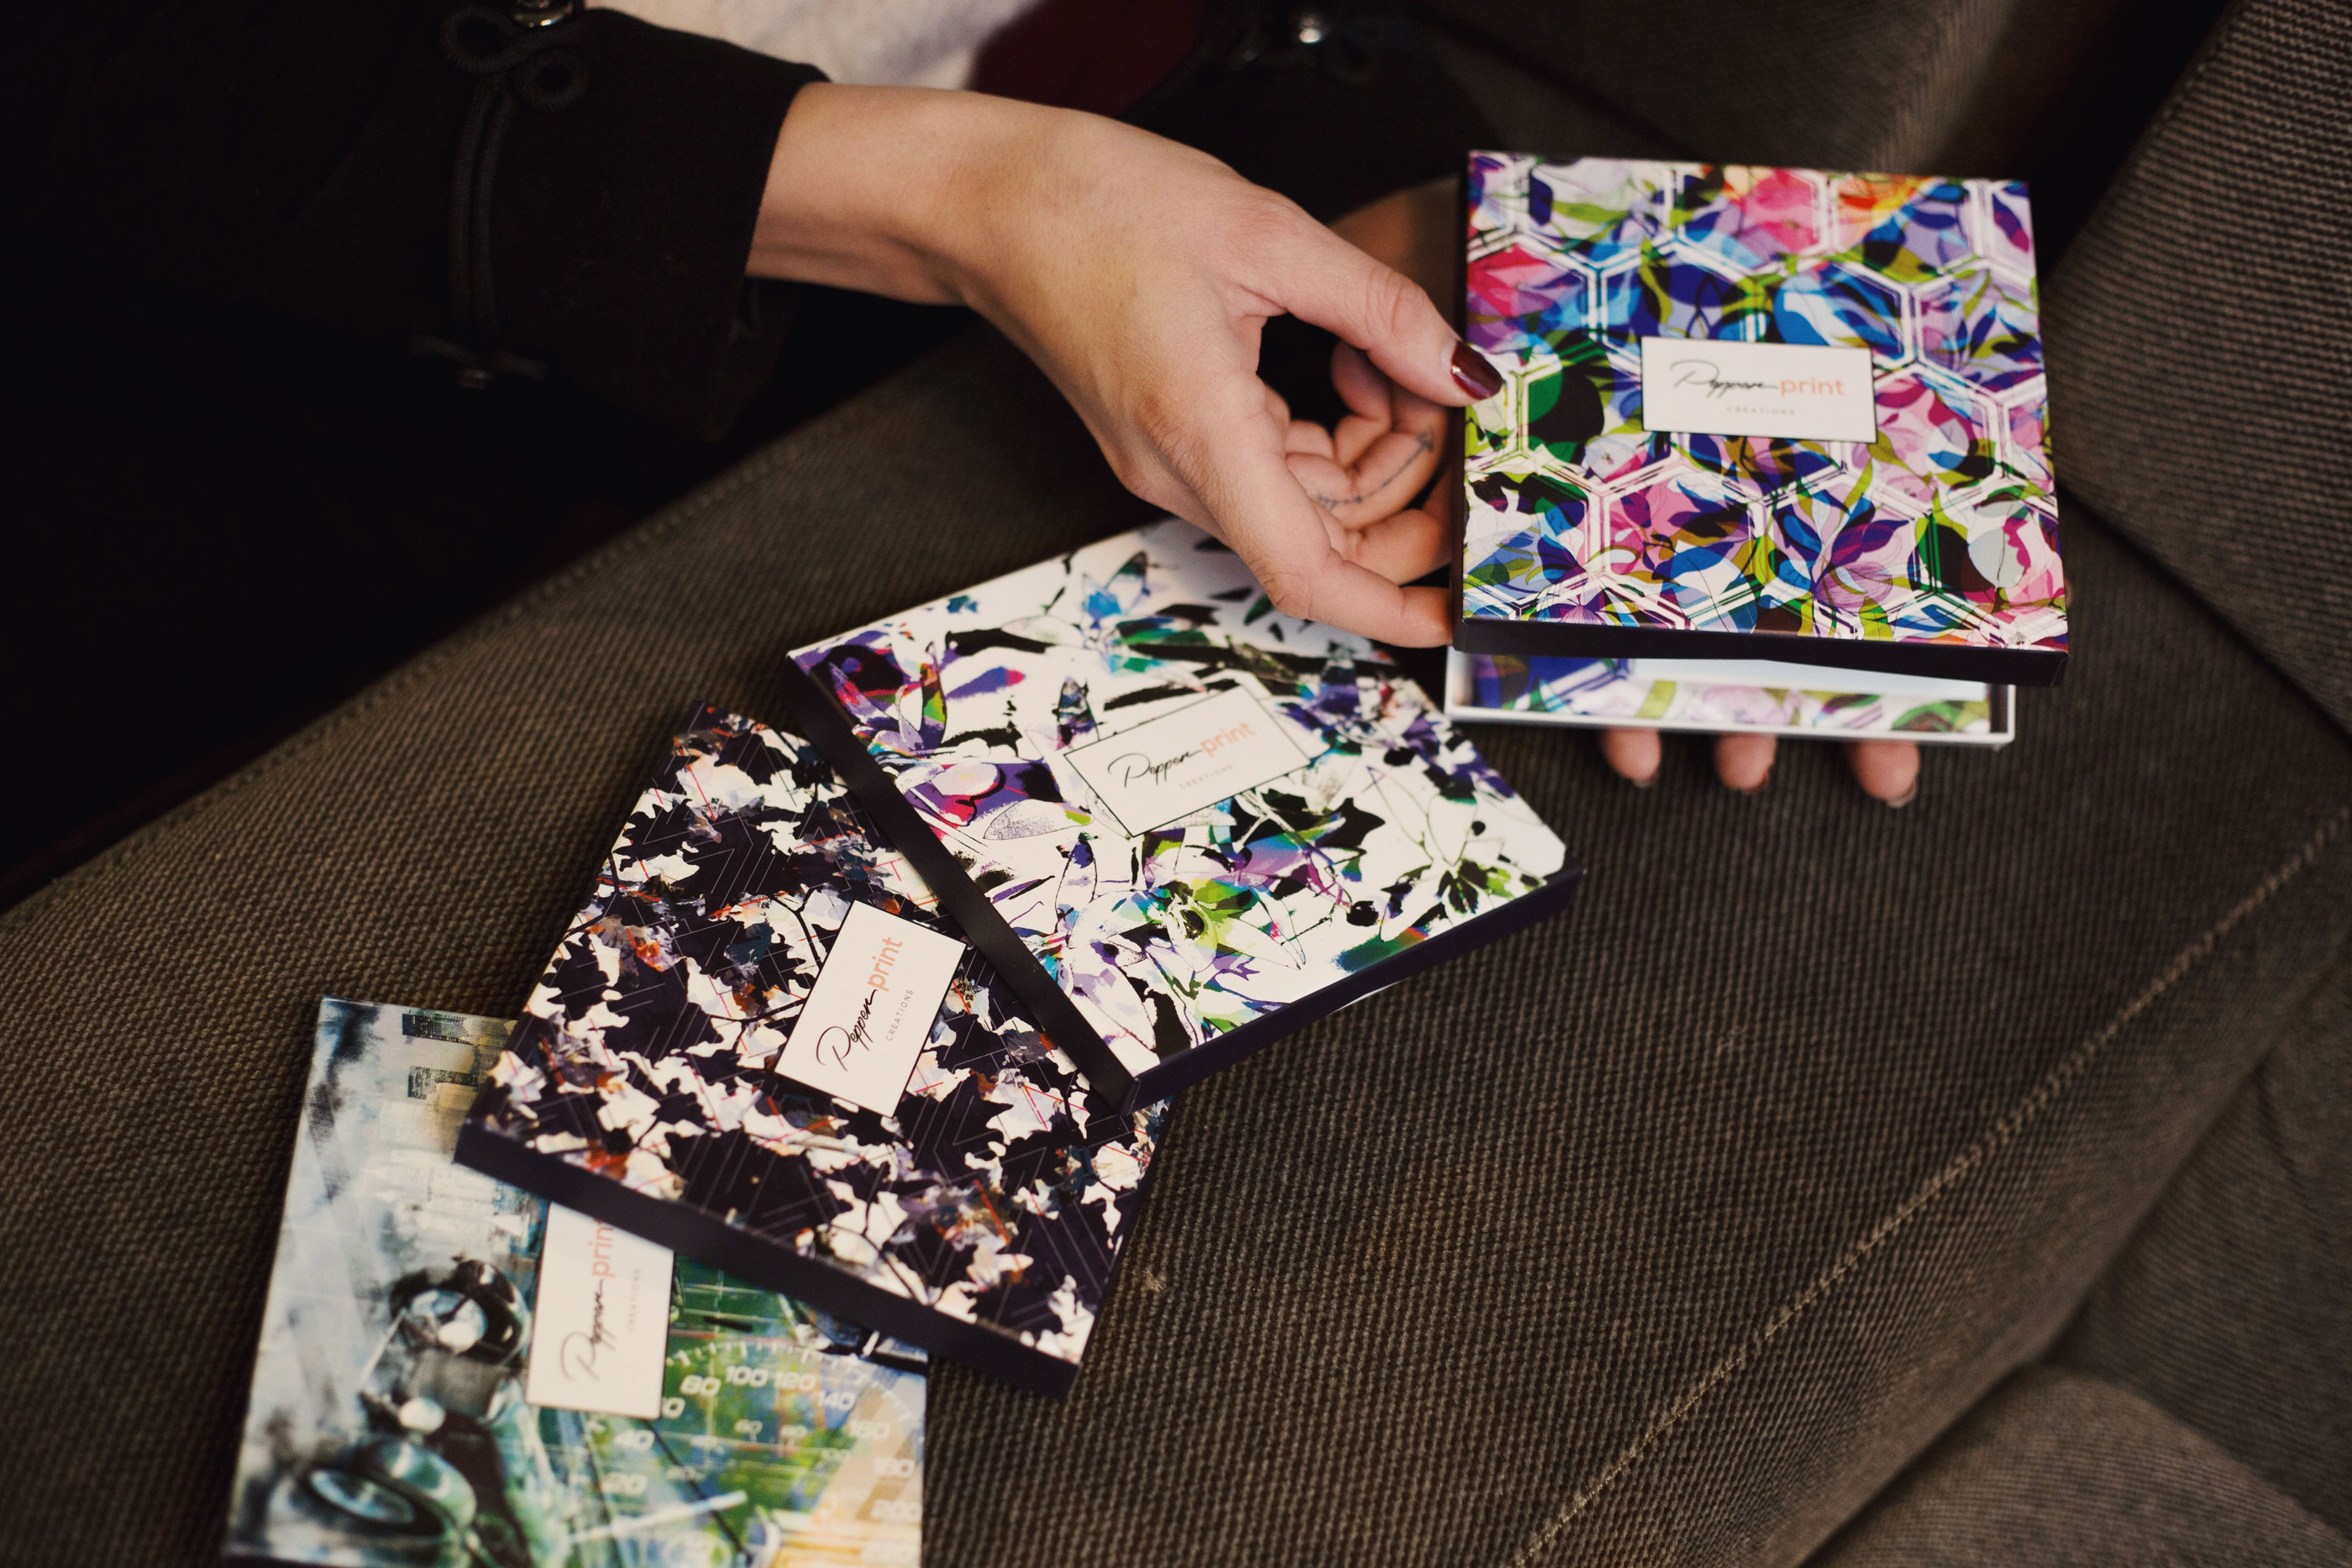 Loop-Schals by Pepperprint Creations - Adventsgewinnspiel   Werbung   How I met my outfit by Dana Lohmüller